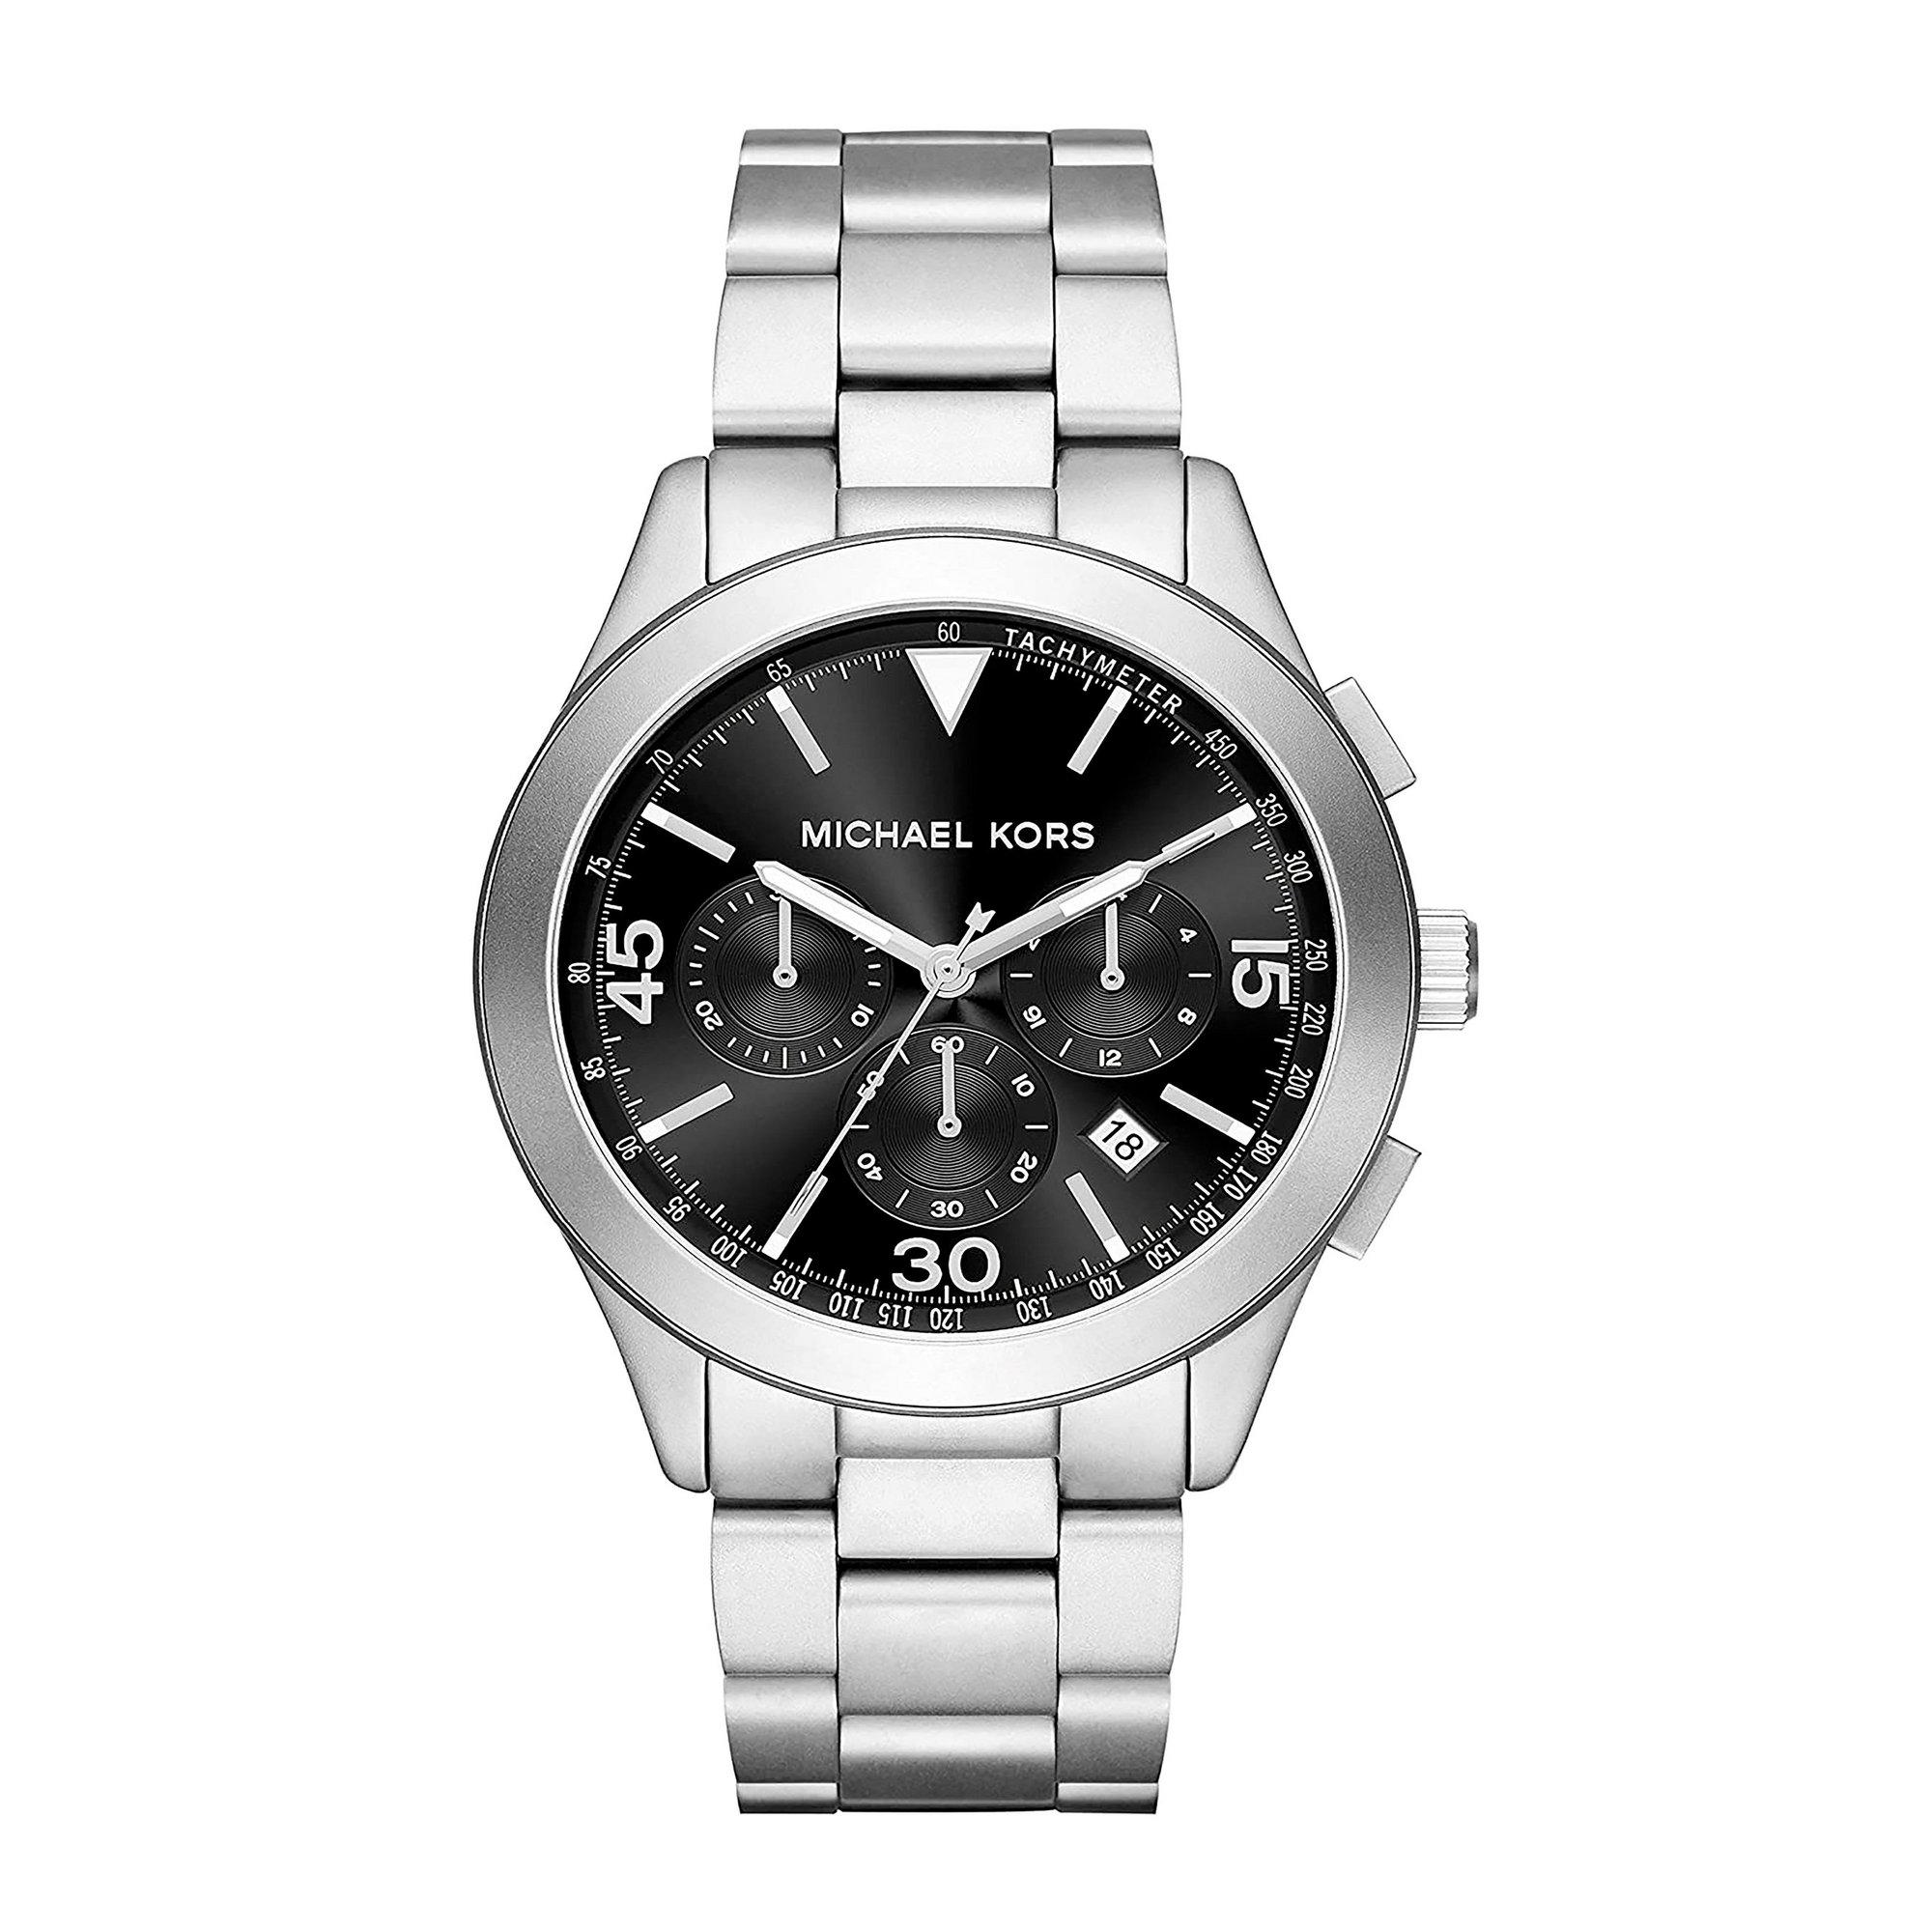 Image of Michael Kors Gents Gareth Chronograph Watch